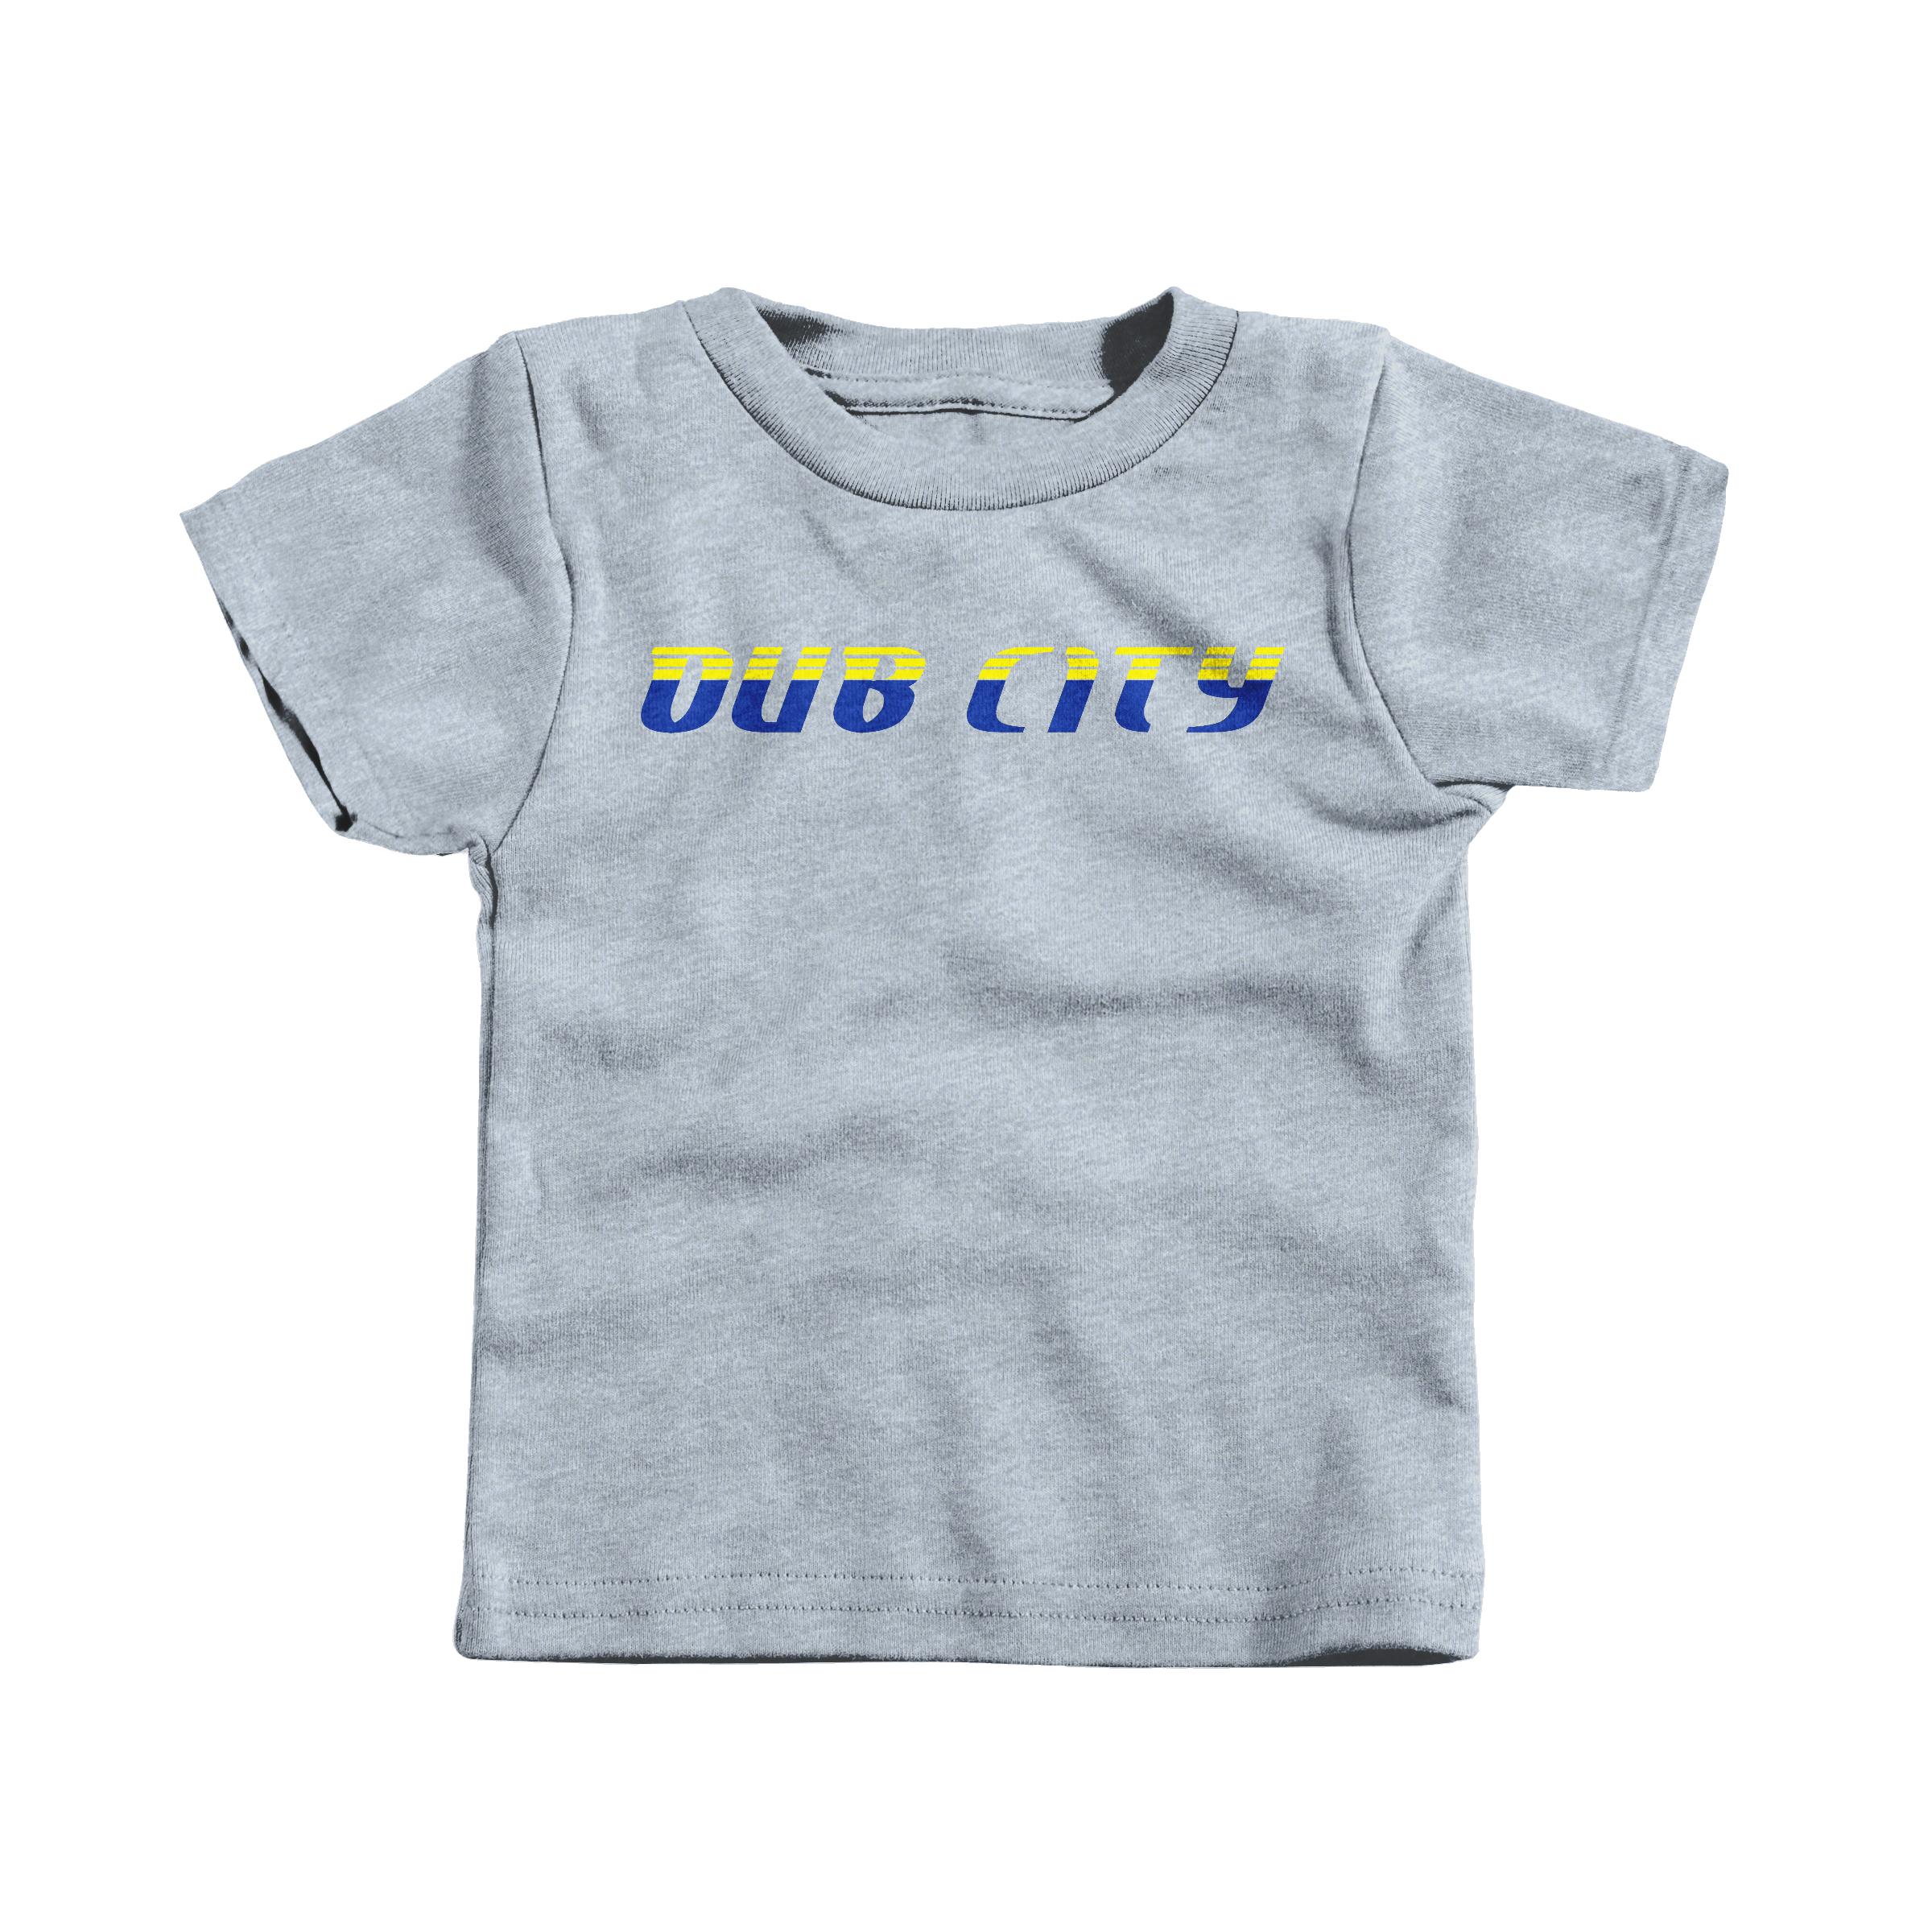 Dub City Two-tone Heather Grey (T-Shirt)